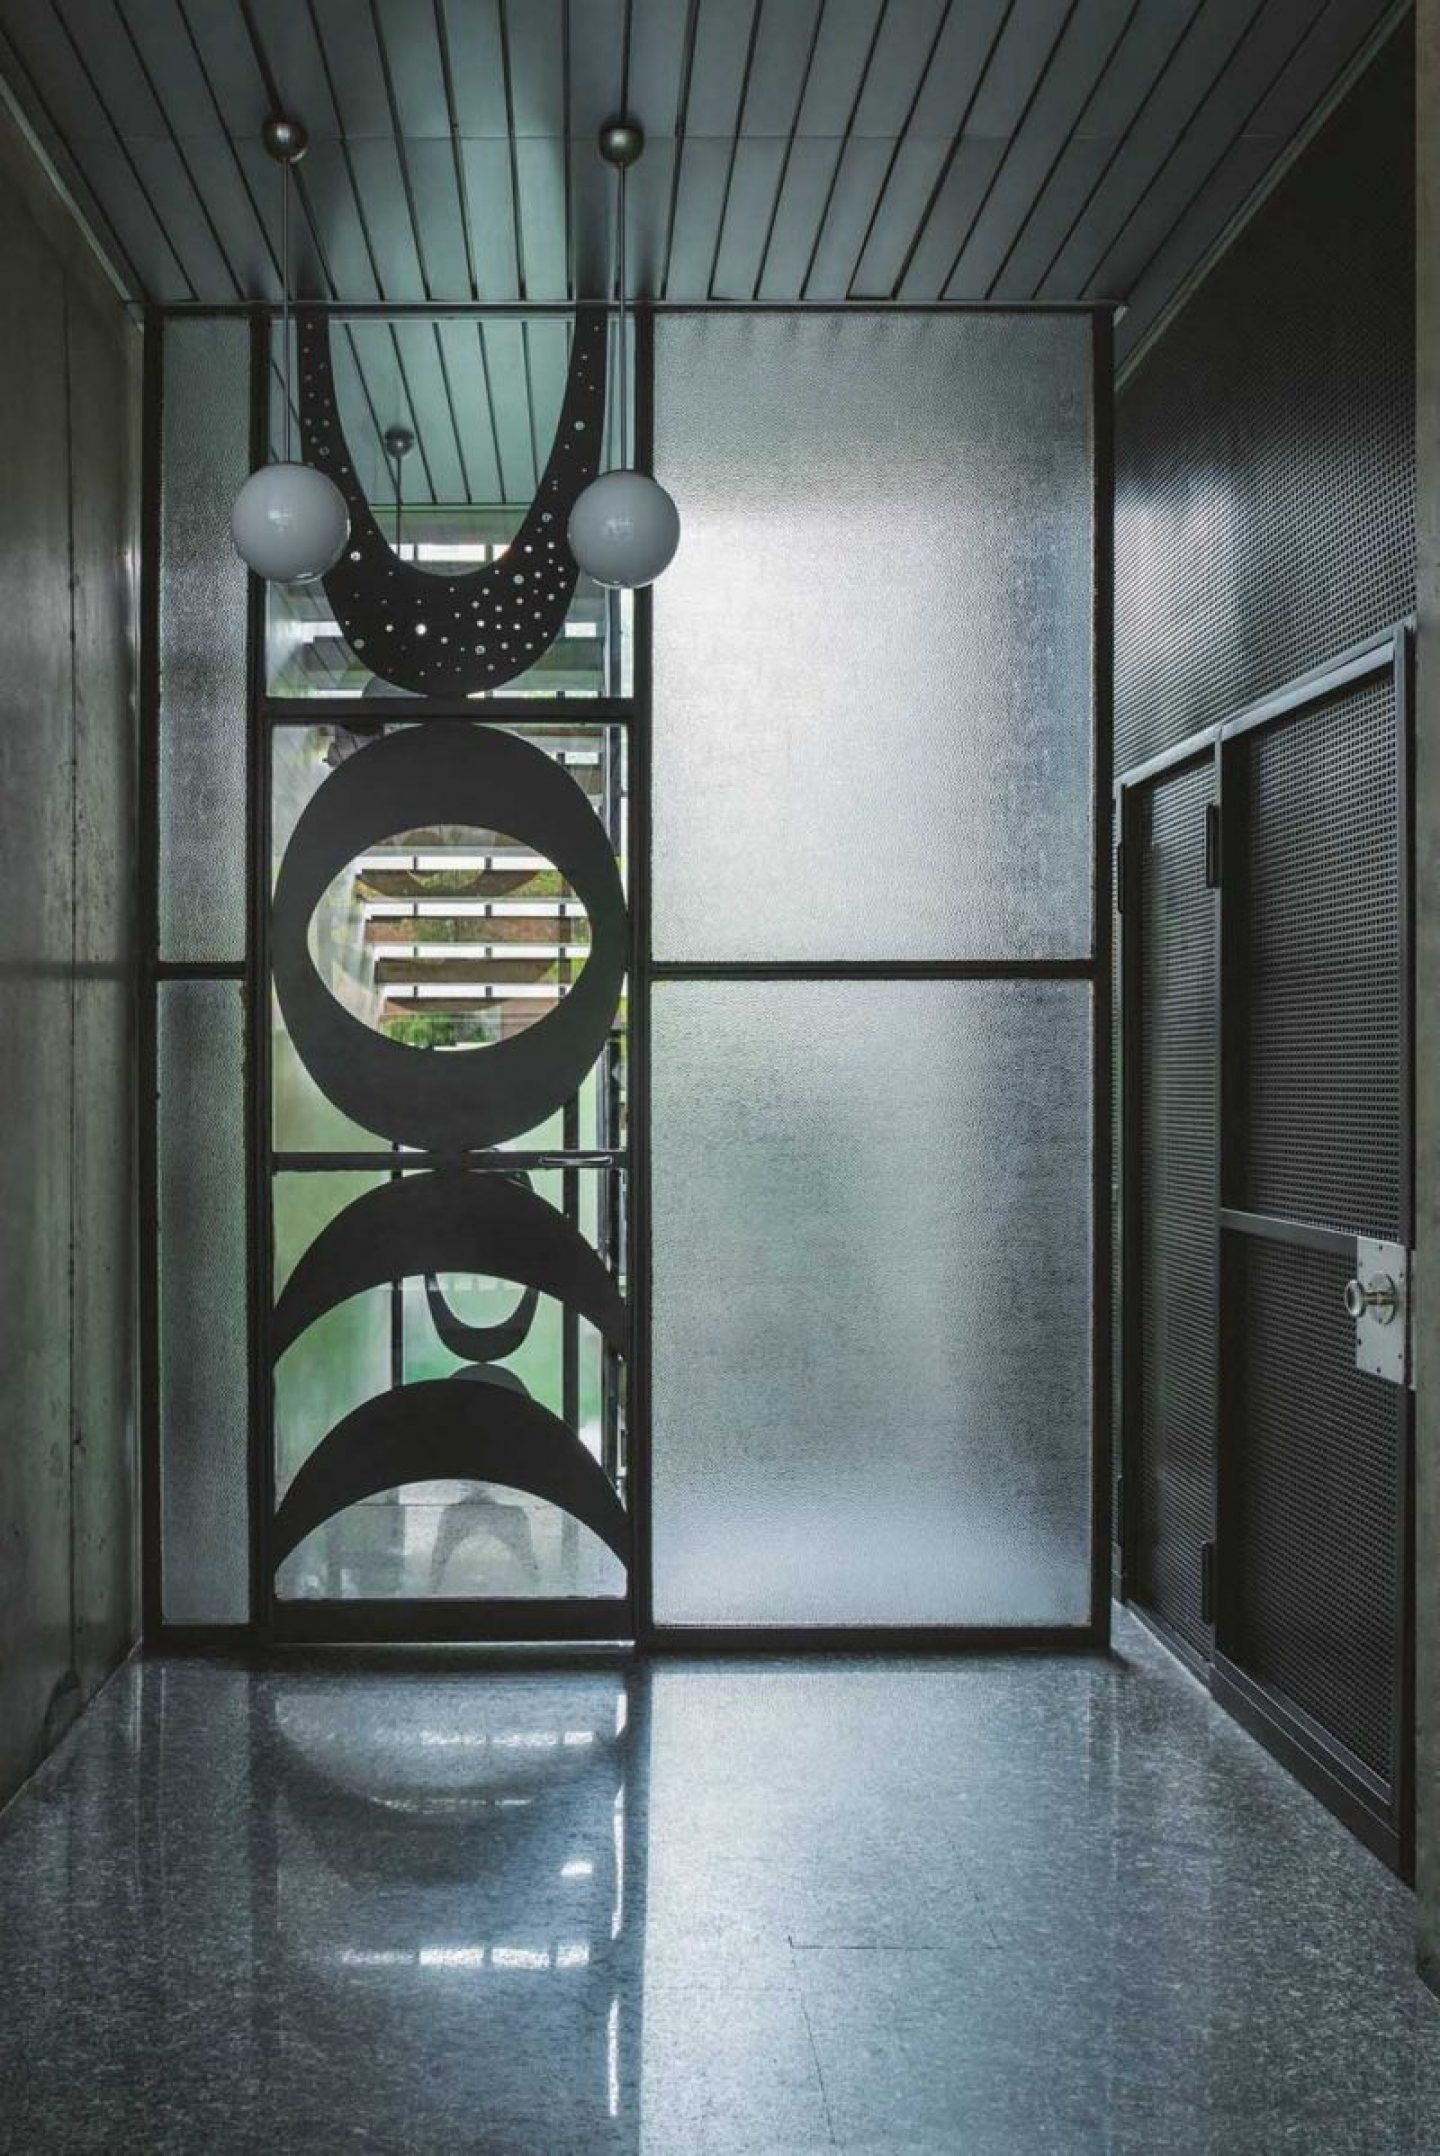 iGNANT_Architecture_Karl_Kolbitz_Taschen_Entryways_of_Milan_Ingressi_di_Milano_4